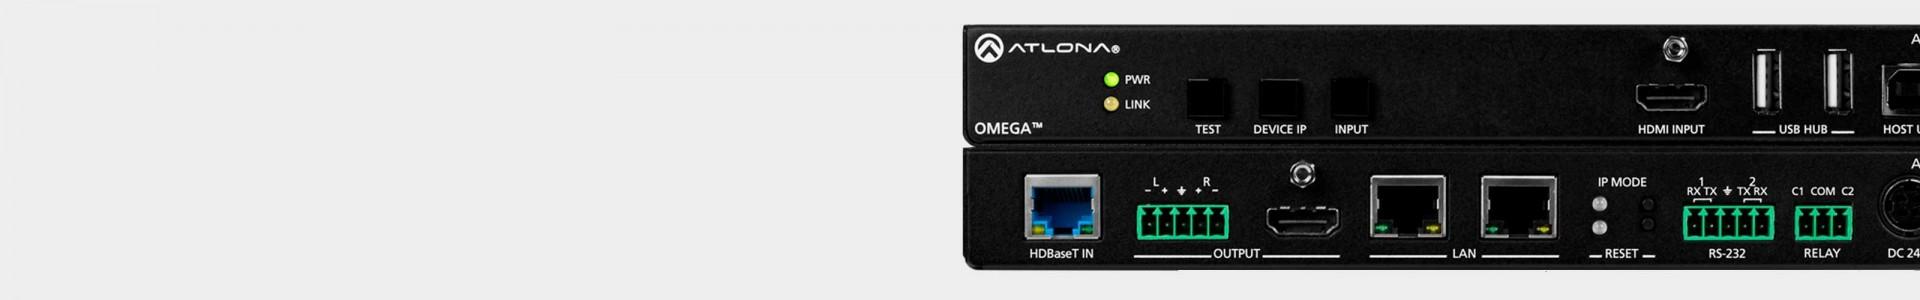 Atlona video extenders - Top quality - Avacab Audiovisuales